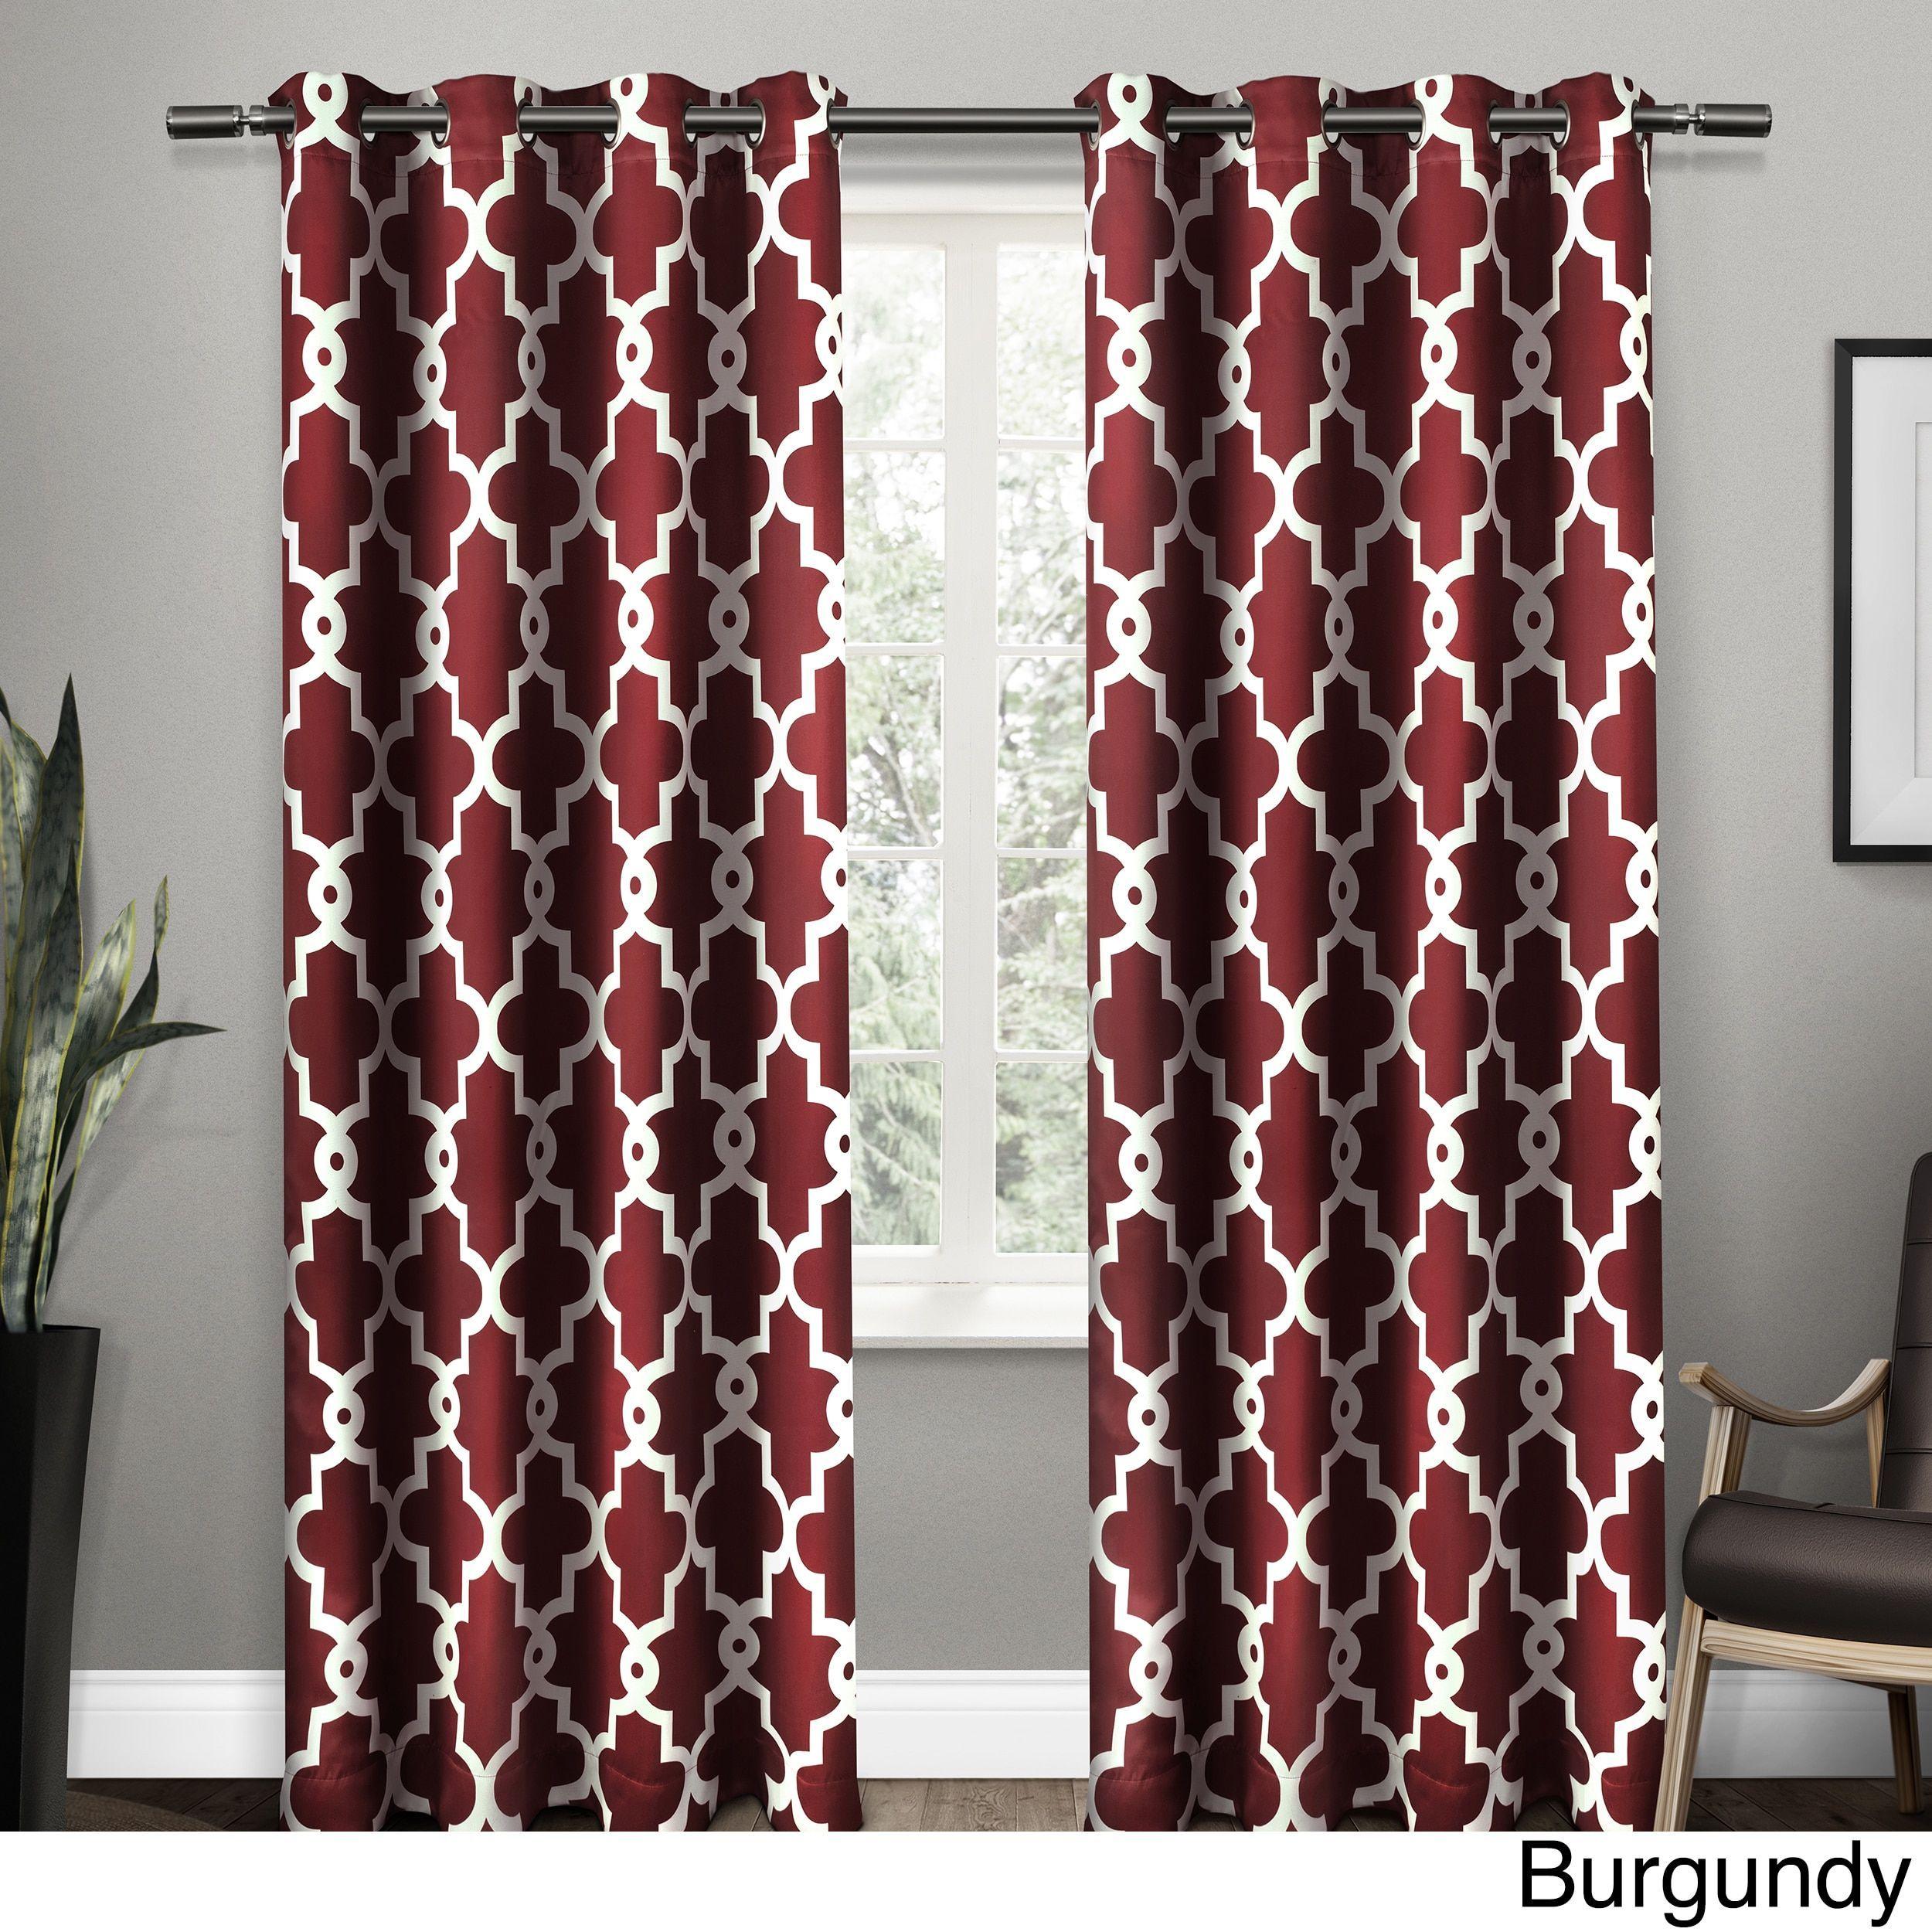 Ati Home Ironwork Grommet Top Window Curtain Panel Pair (Burgundy